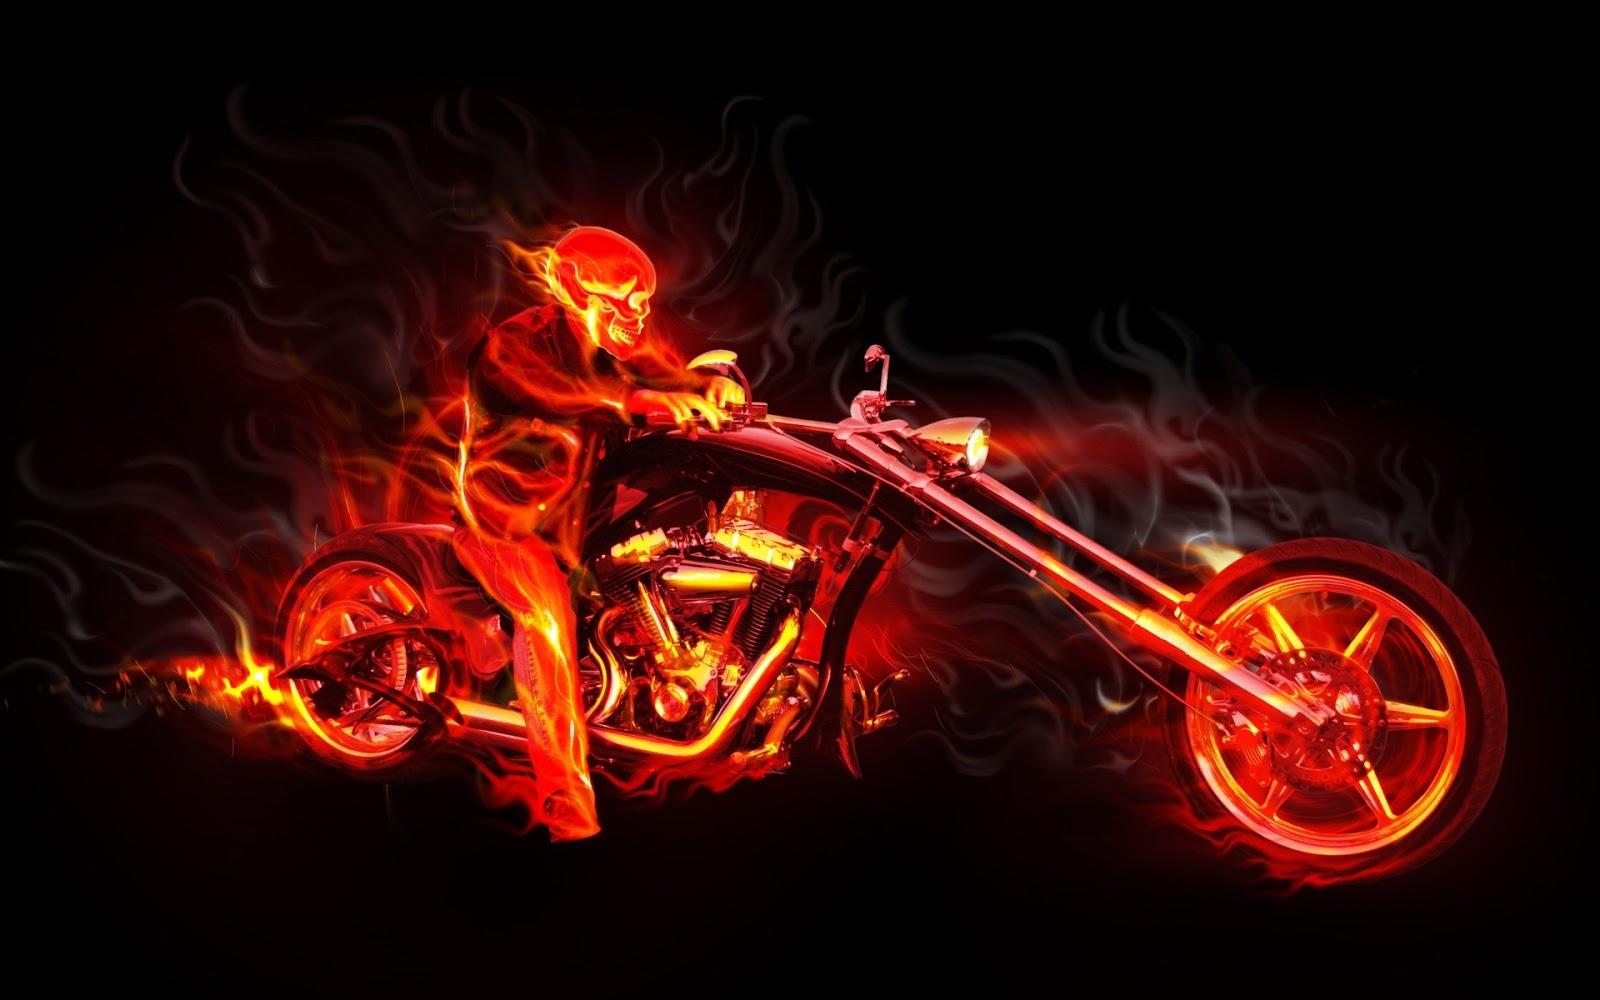 Harley Davidson Number One Skull Logo Papeis De Parede Motoquiro Fantasma Clqiues Diversos